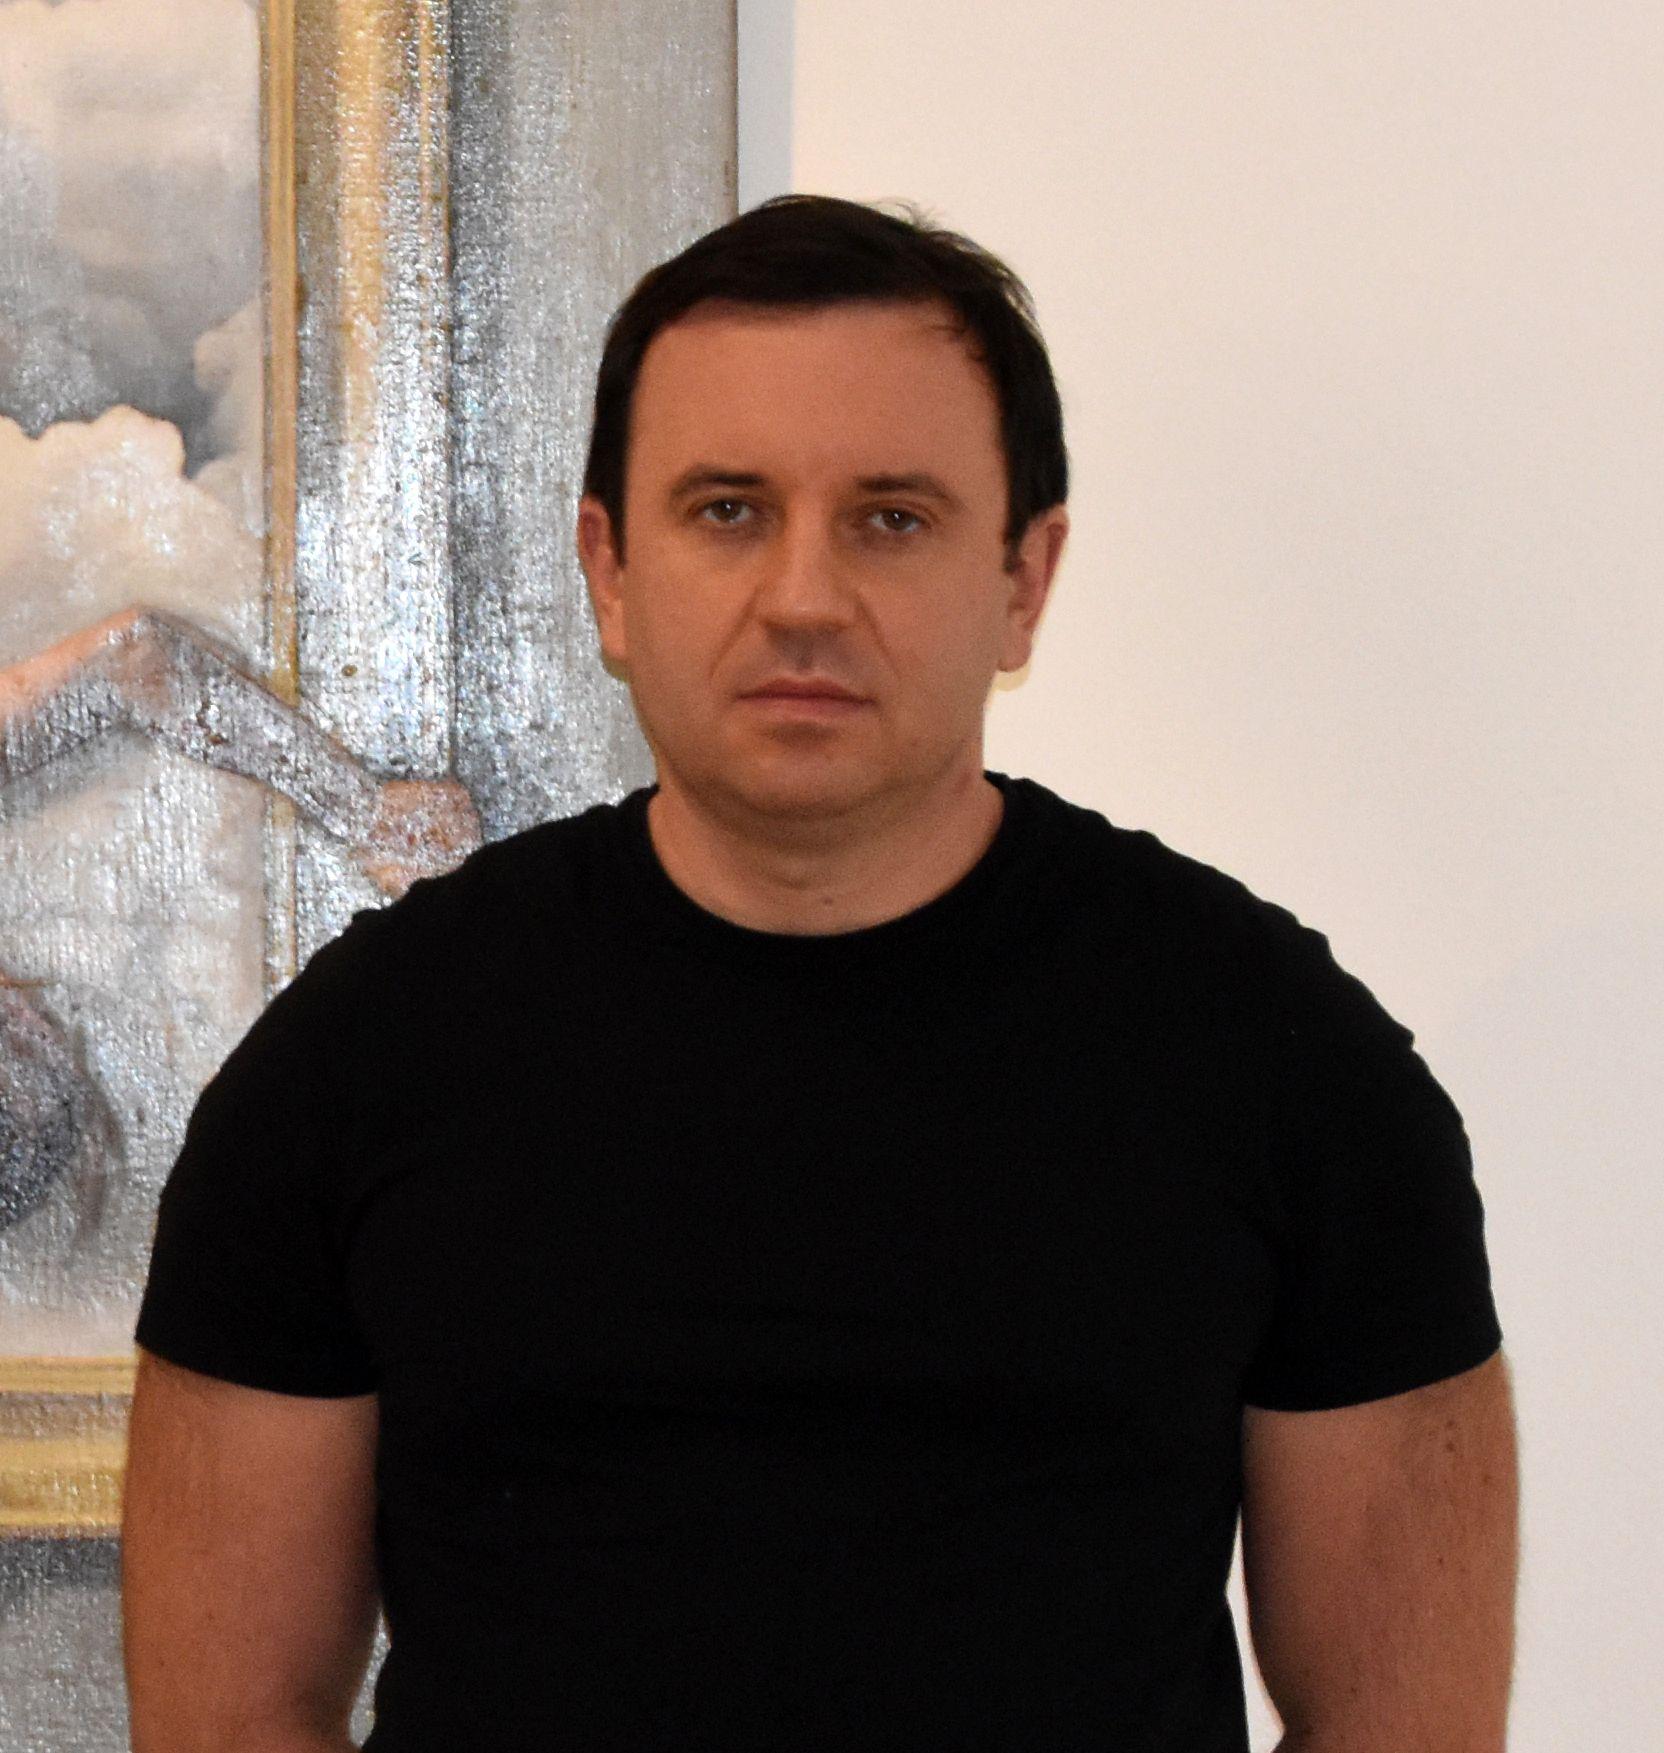 Roman Rembovsky